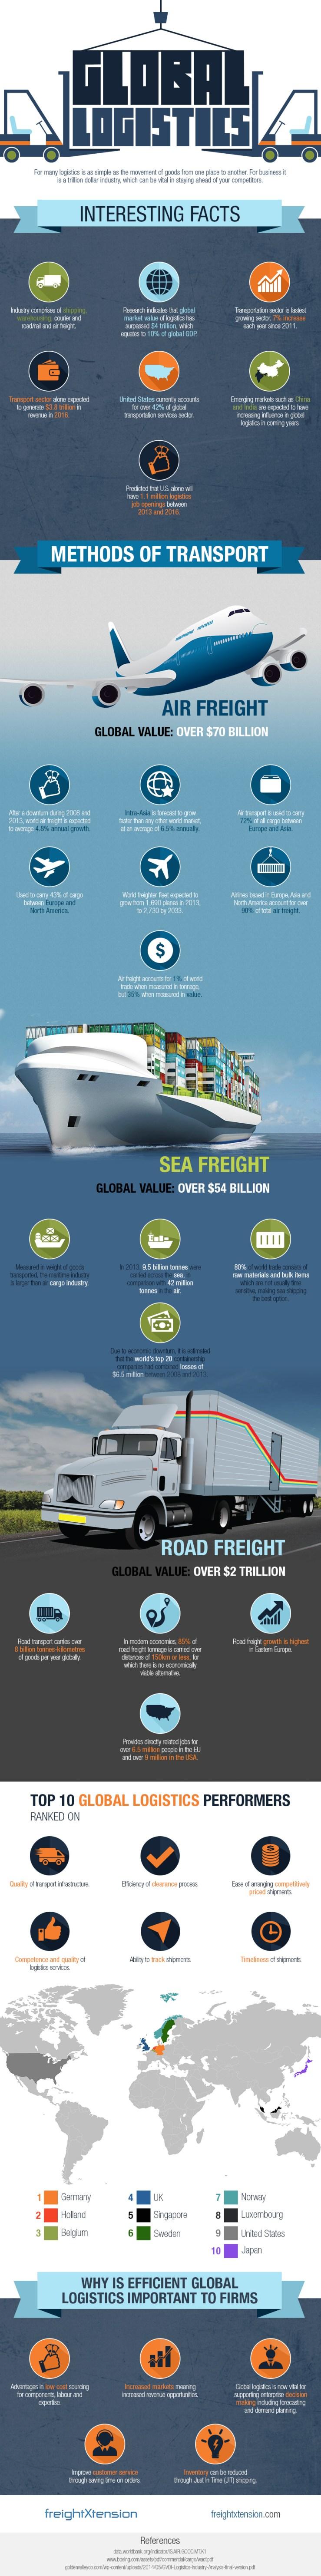 global-logistics-market-infographic.jpg